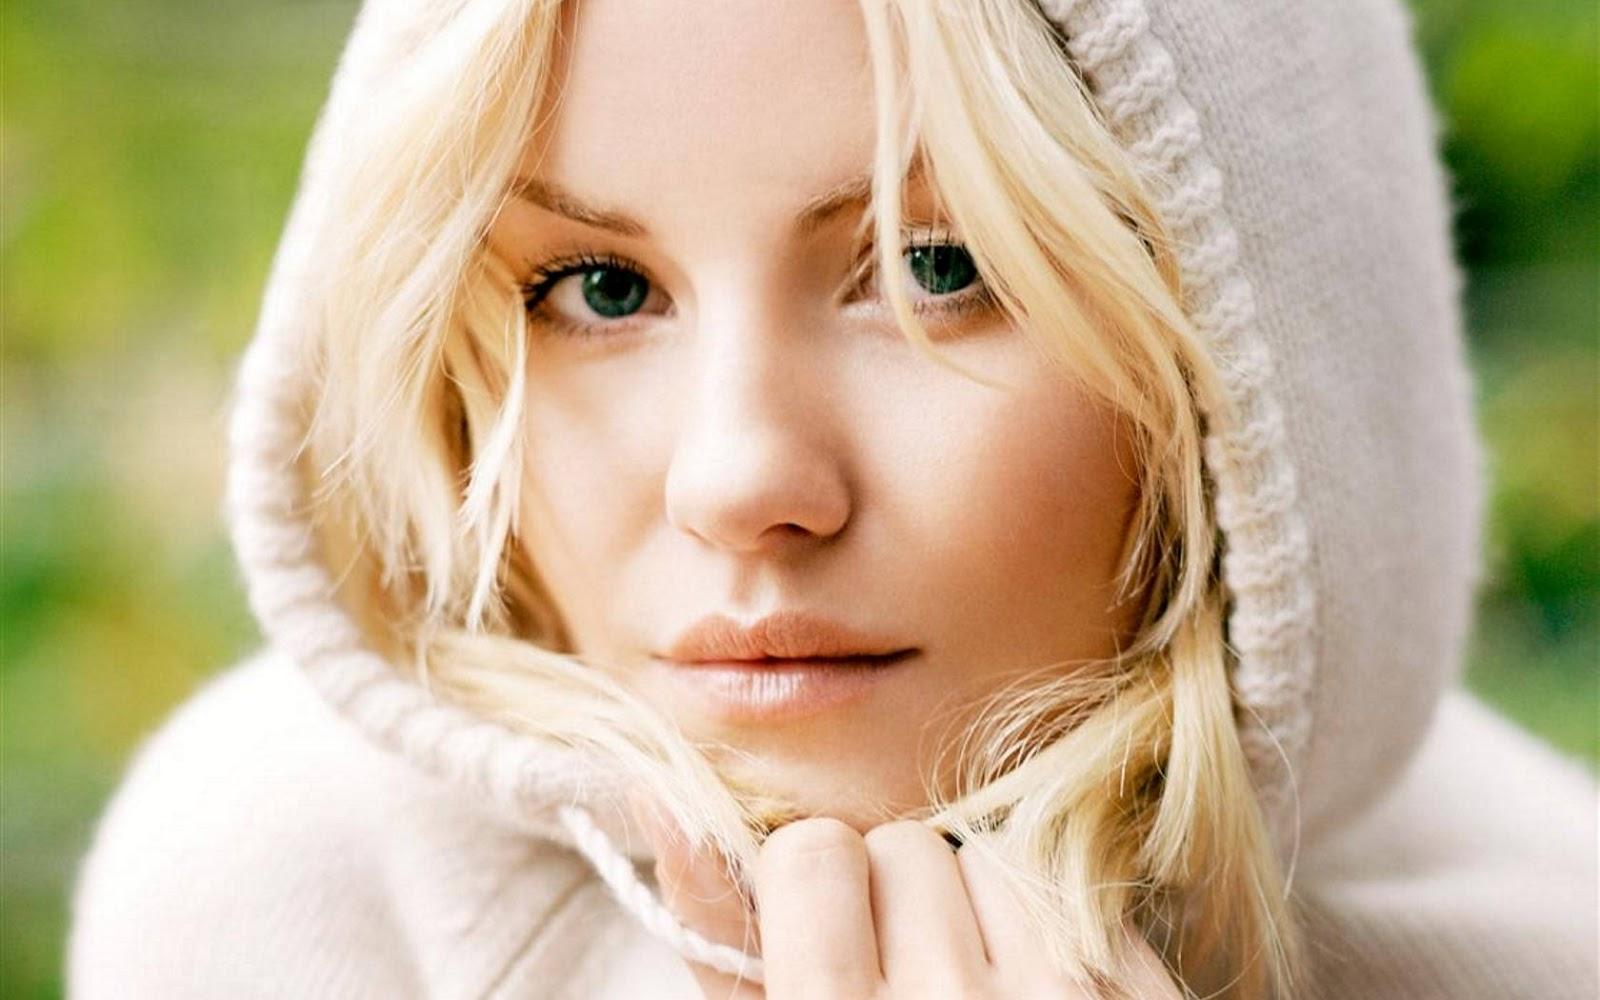 gorgeous actress elisha cuthbert - photo #4